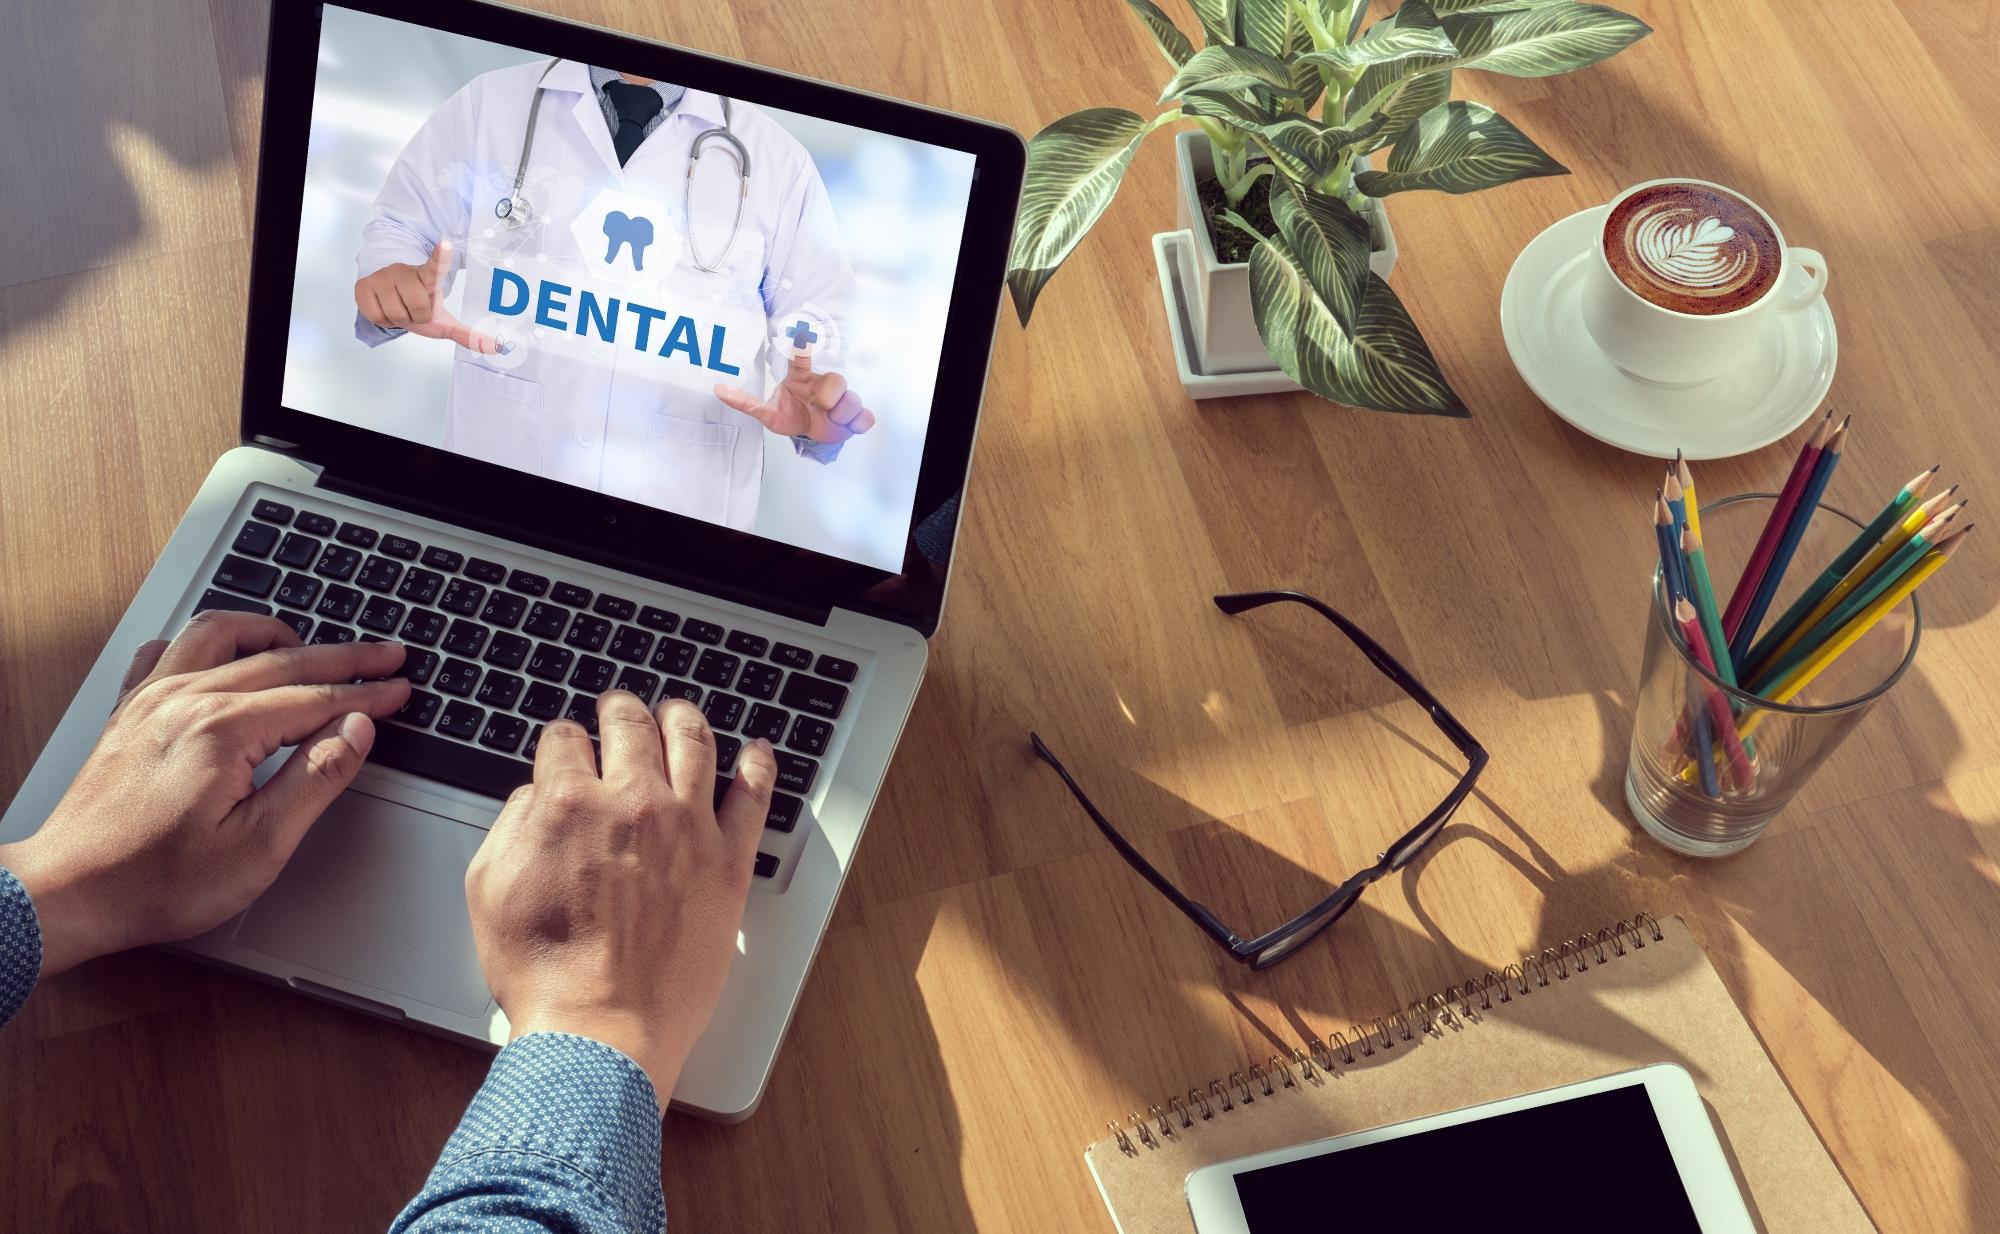 Is your dental practice website user friendly